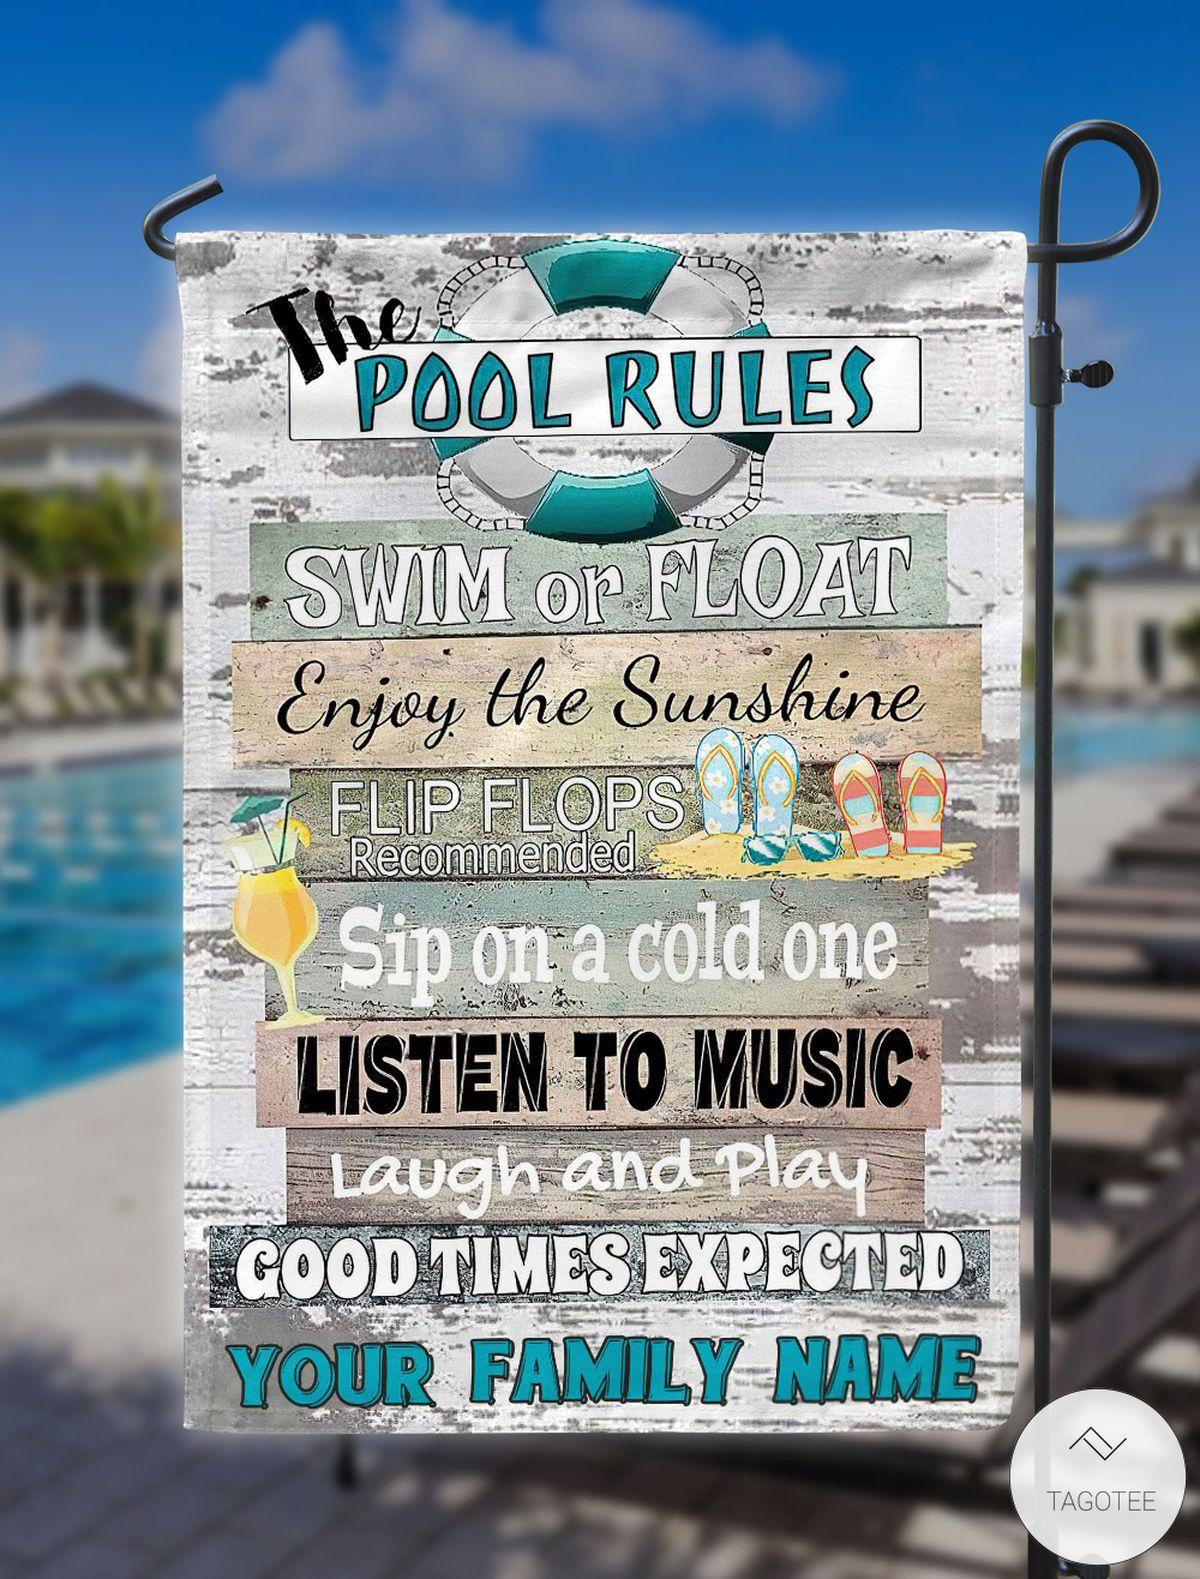 The pool rules swim or float enjoy the sunshine flag